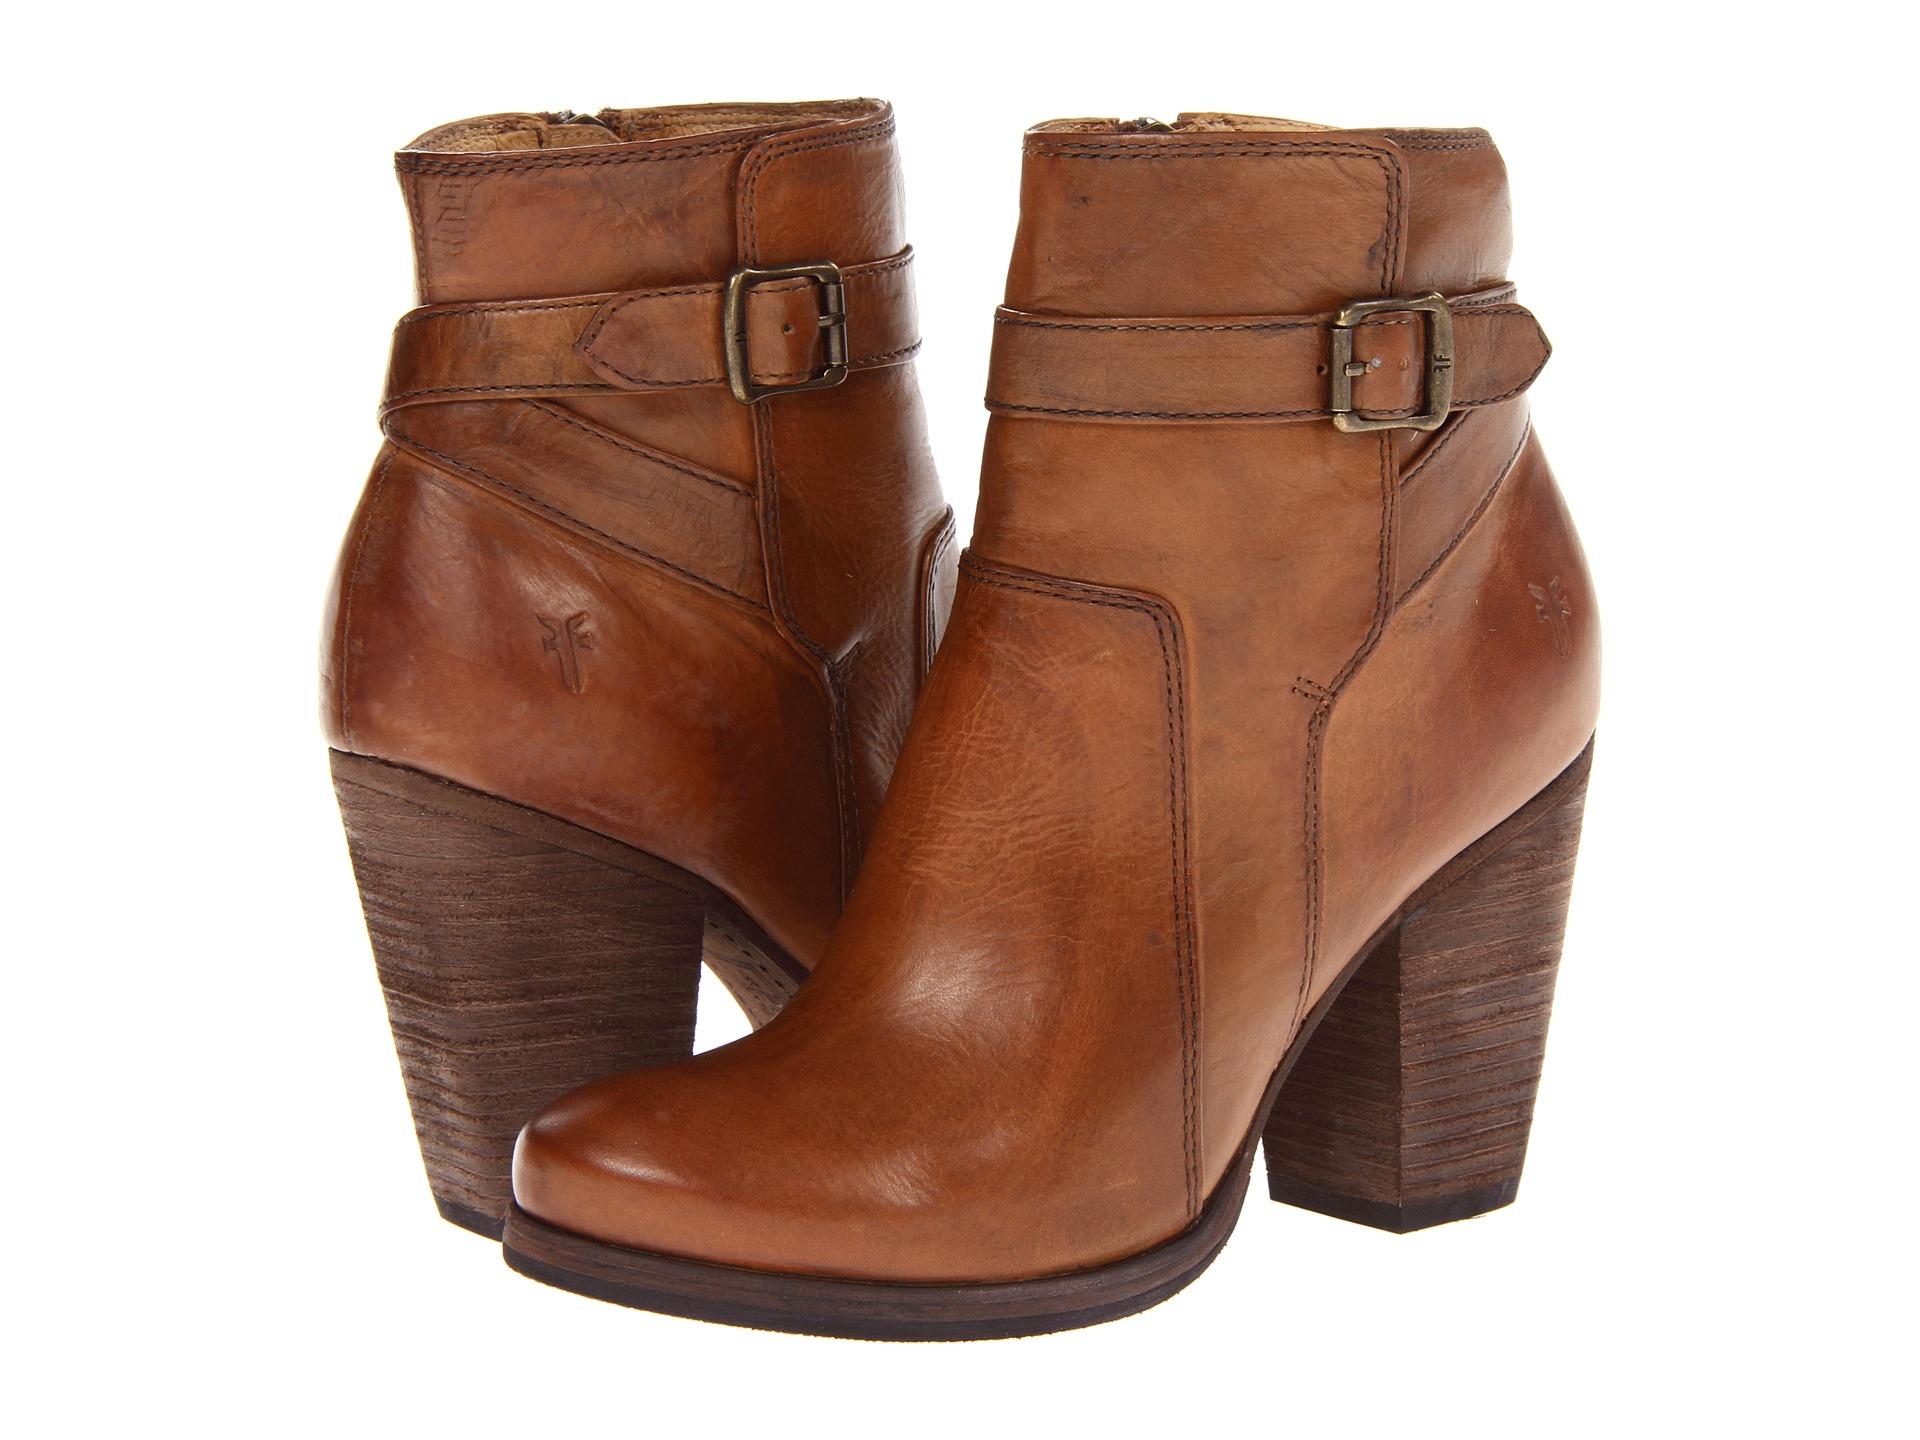 zappos frye boots womens italian sandals